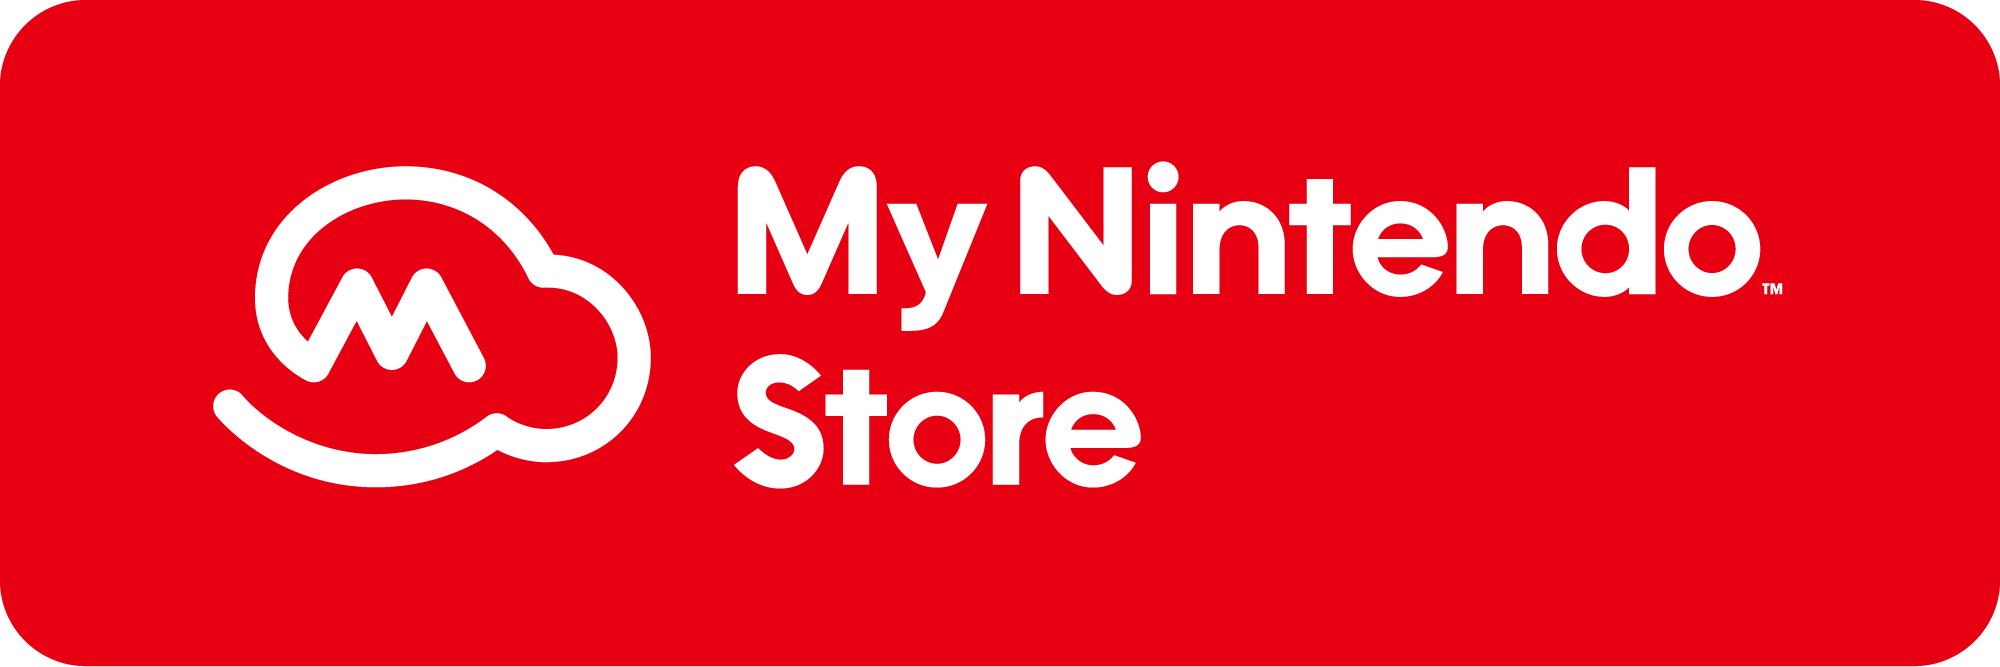 Nintendo Store Logo